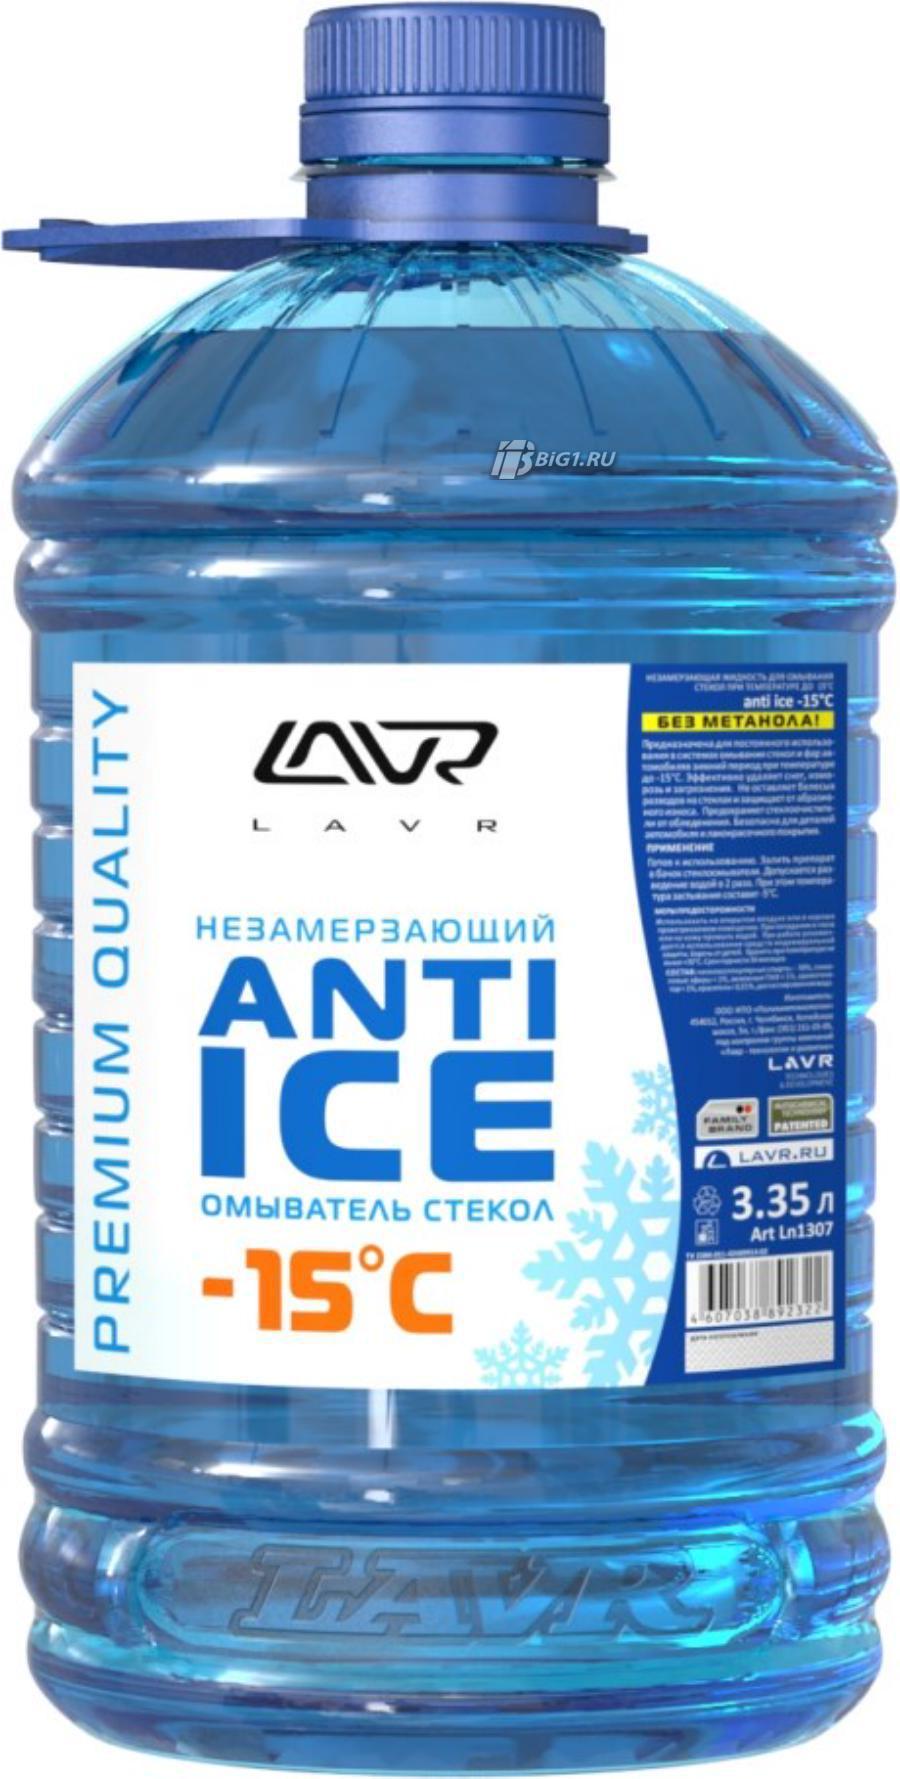 Незамерзающий омыватель стекол (-15) LAVR Anti Ice